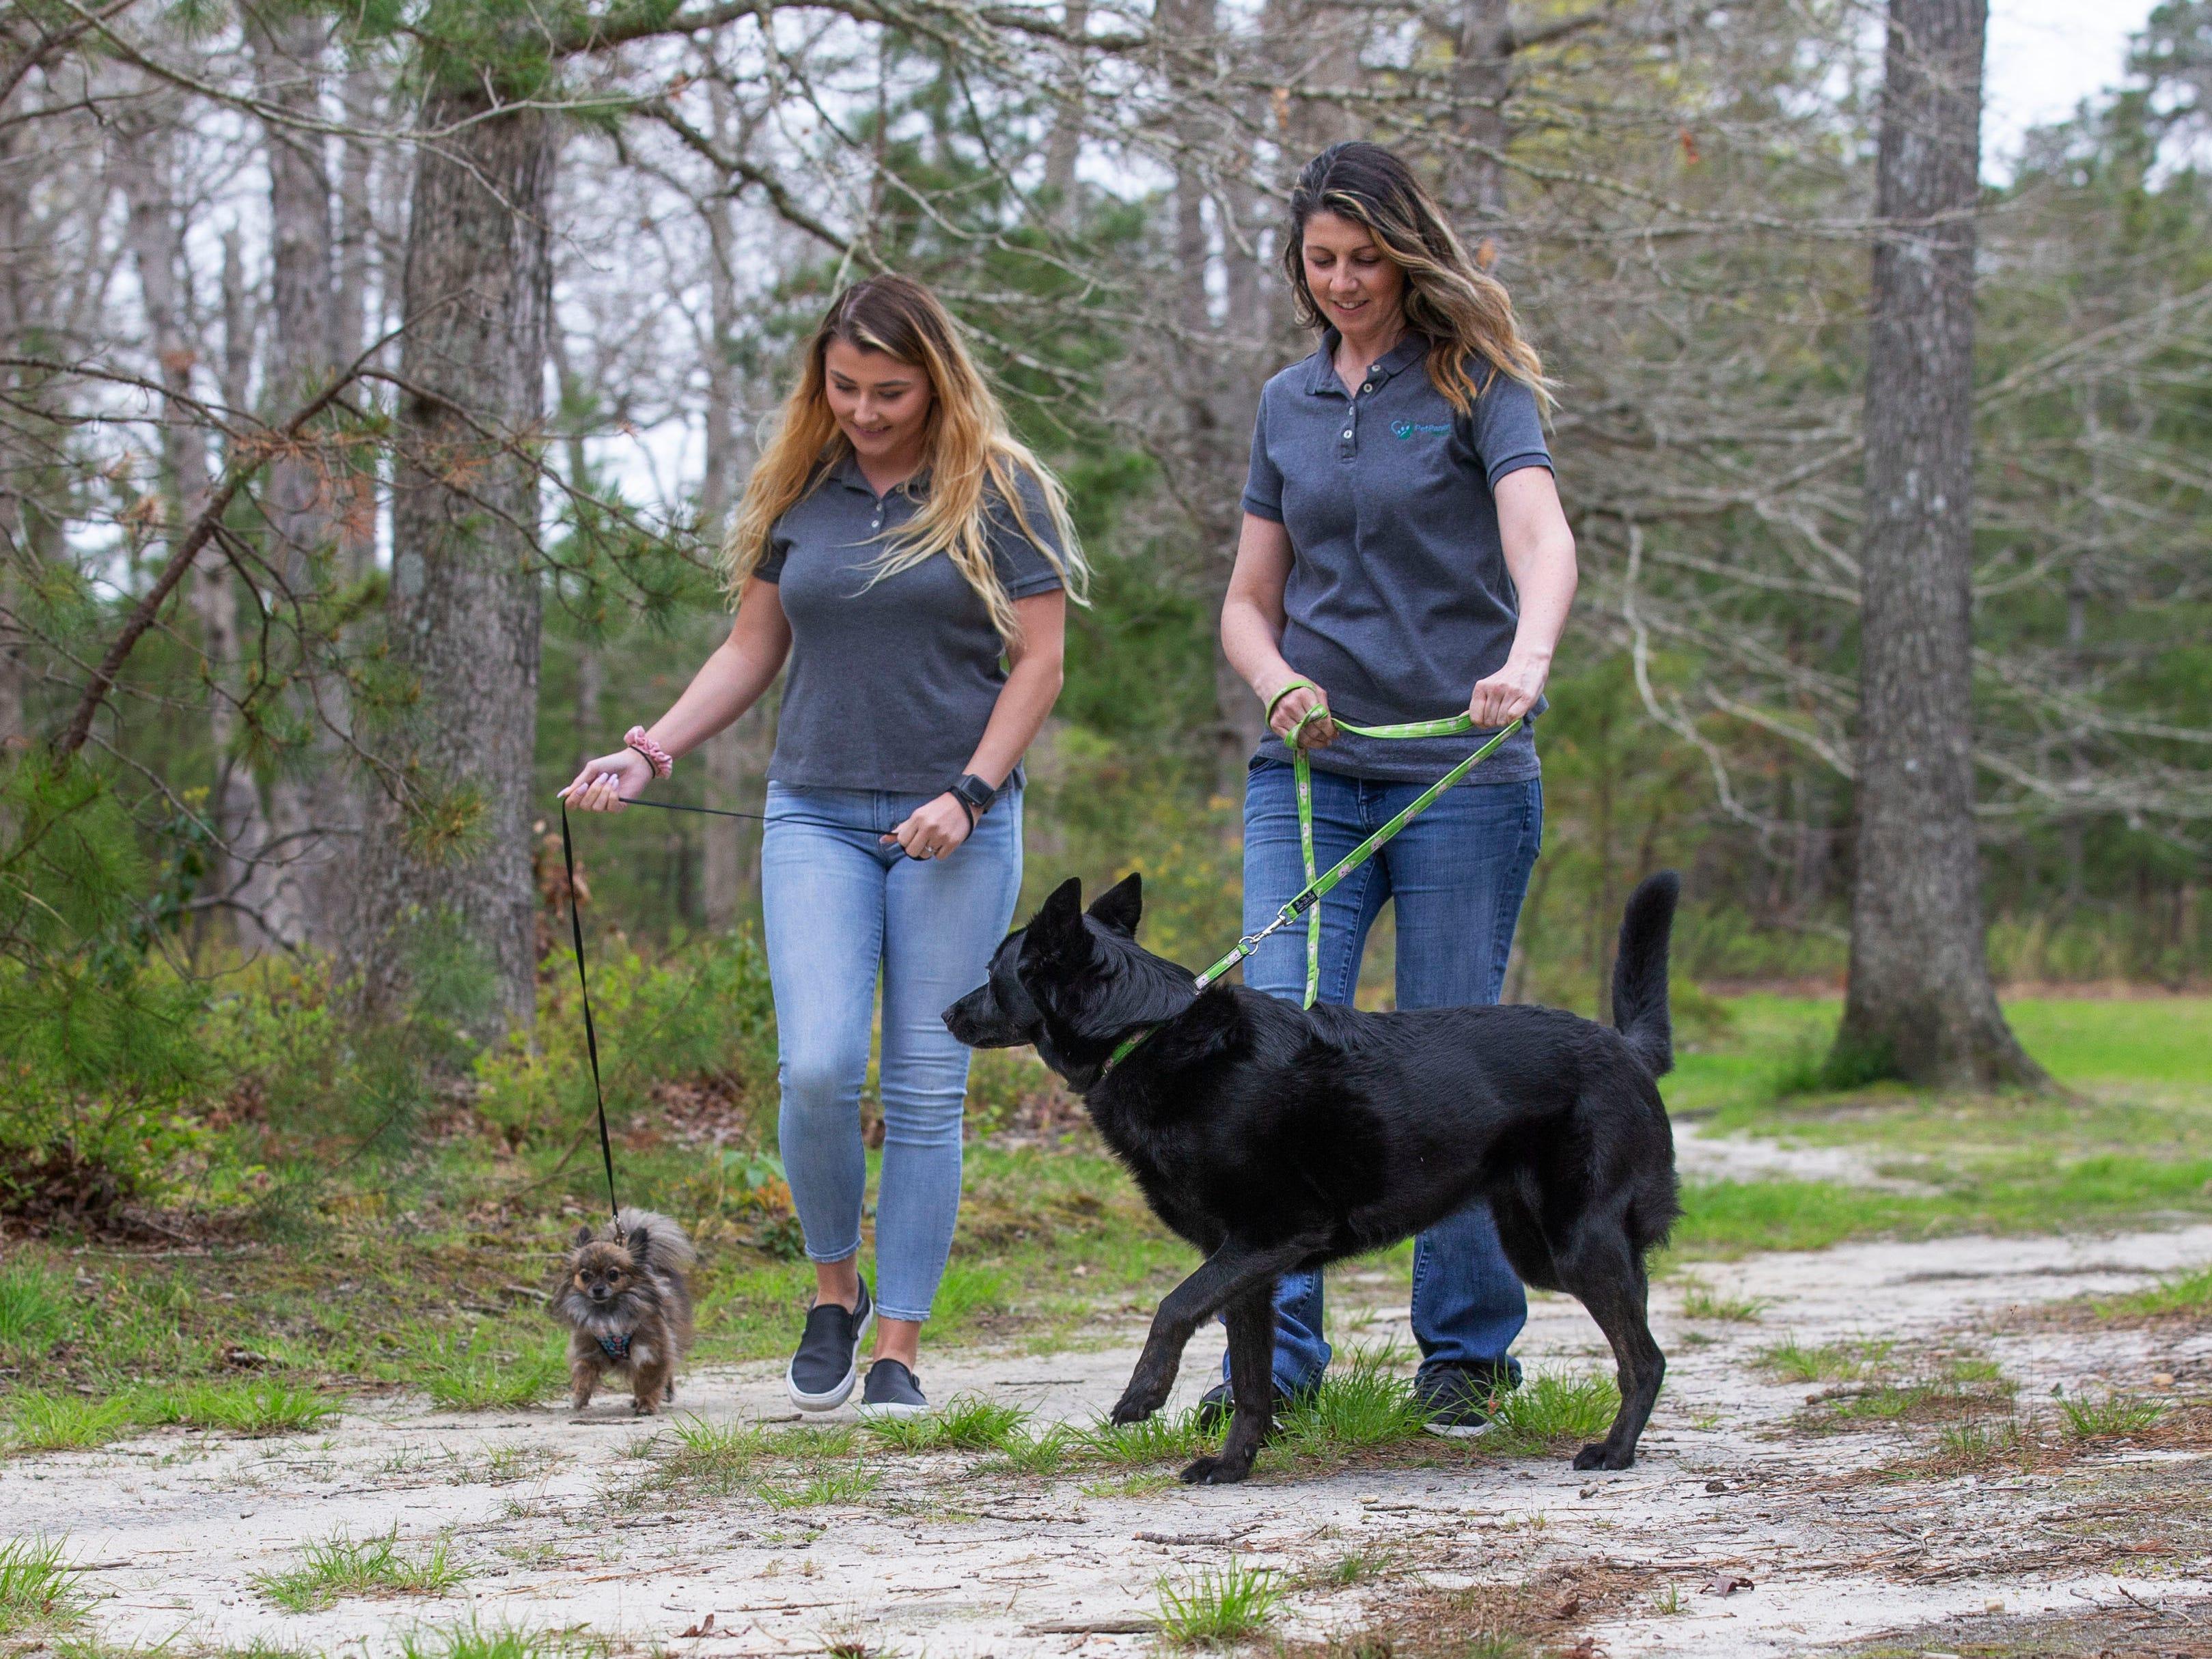 Rose Burke (right) of PetPanion Pet Care in Barnegat walks Zoey while Alexa Merker walks Charlotte.